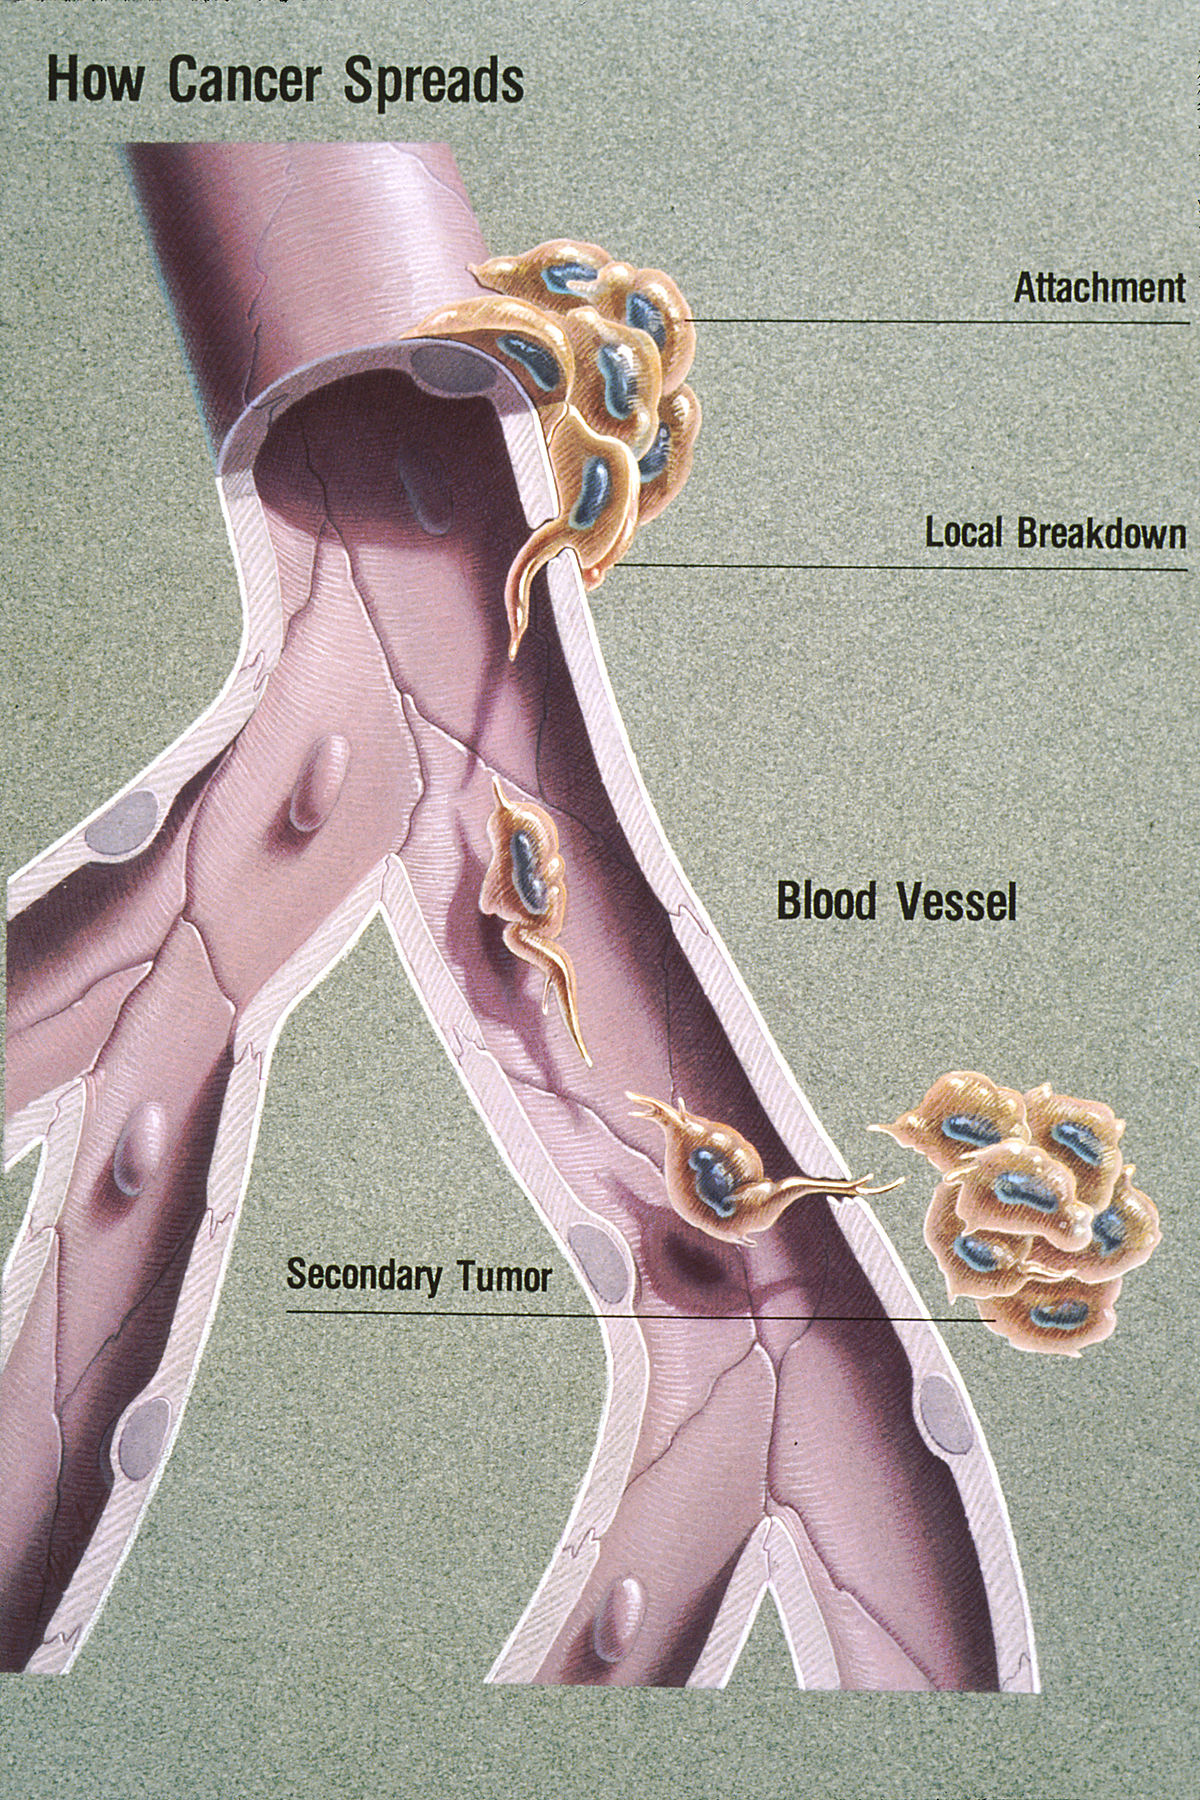 Metastatic cancer meaning in bengali - Înțelesul